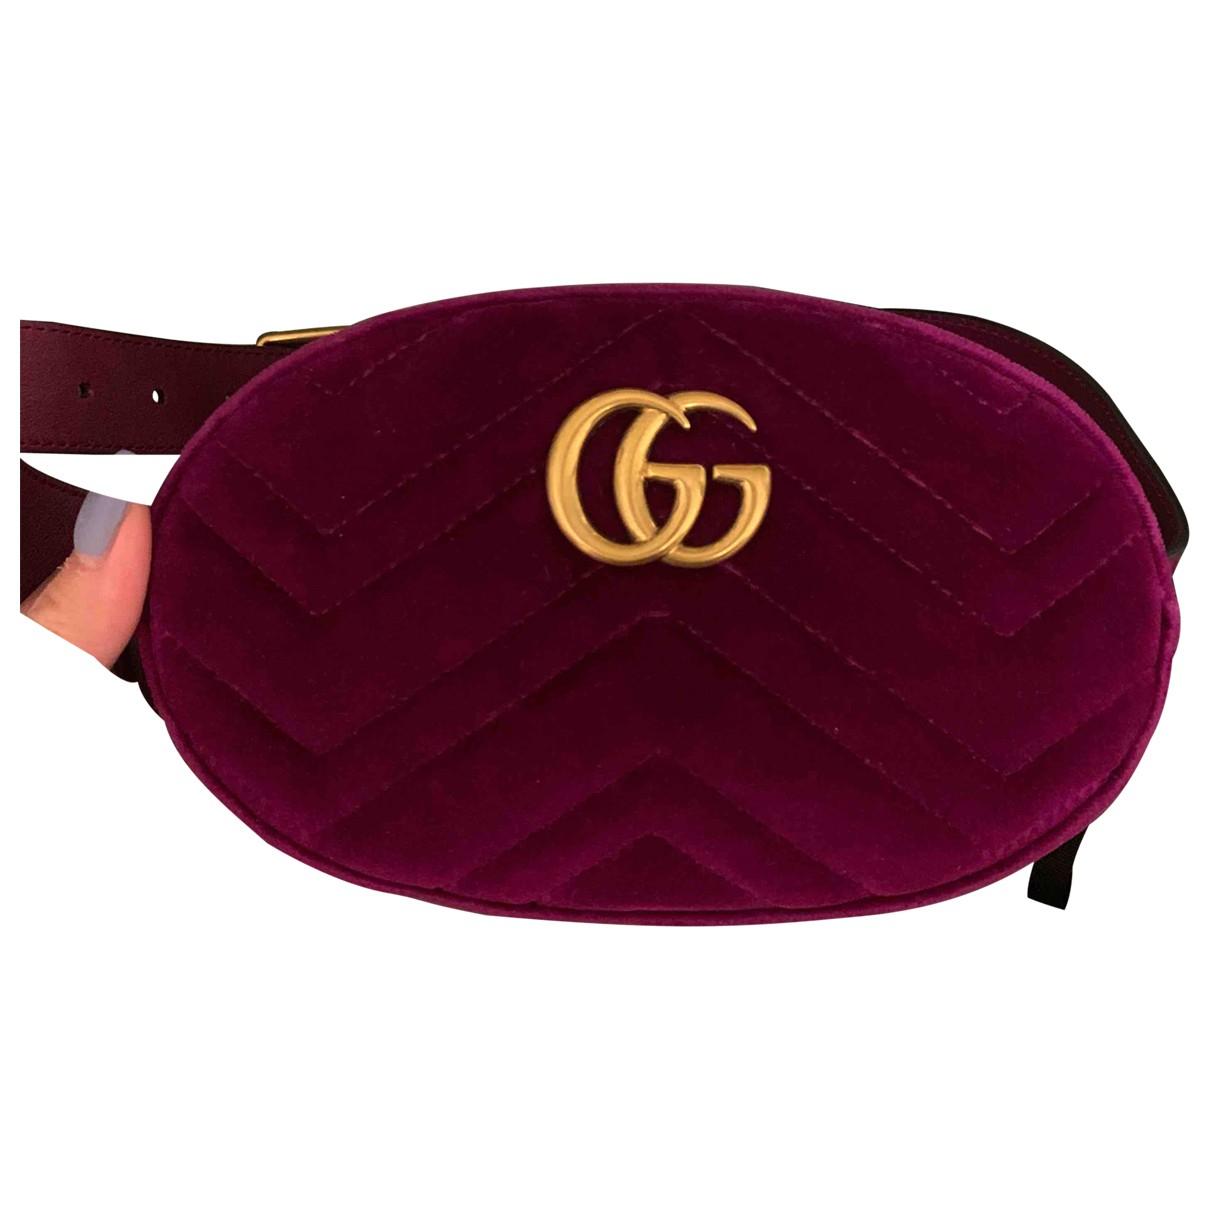 Gucci Marmont Velvet Clutch bag for Women N